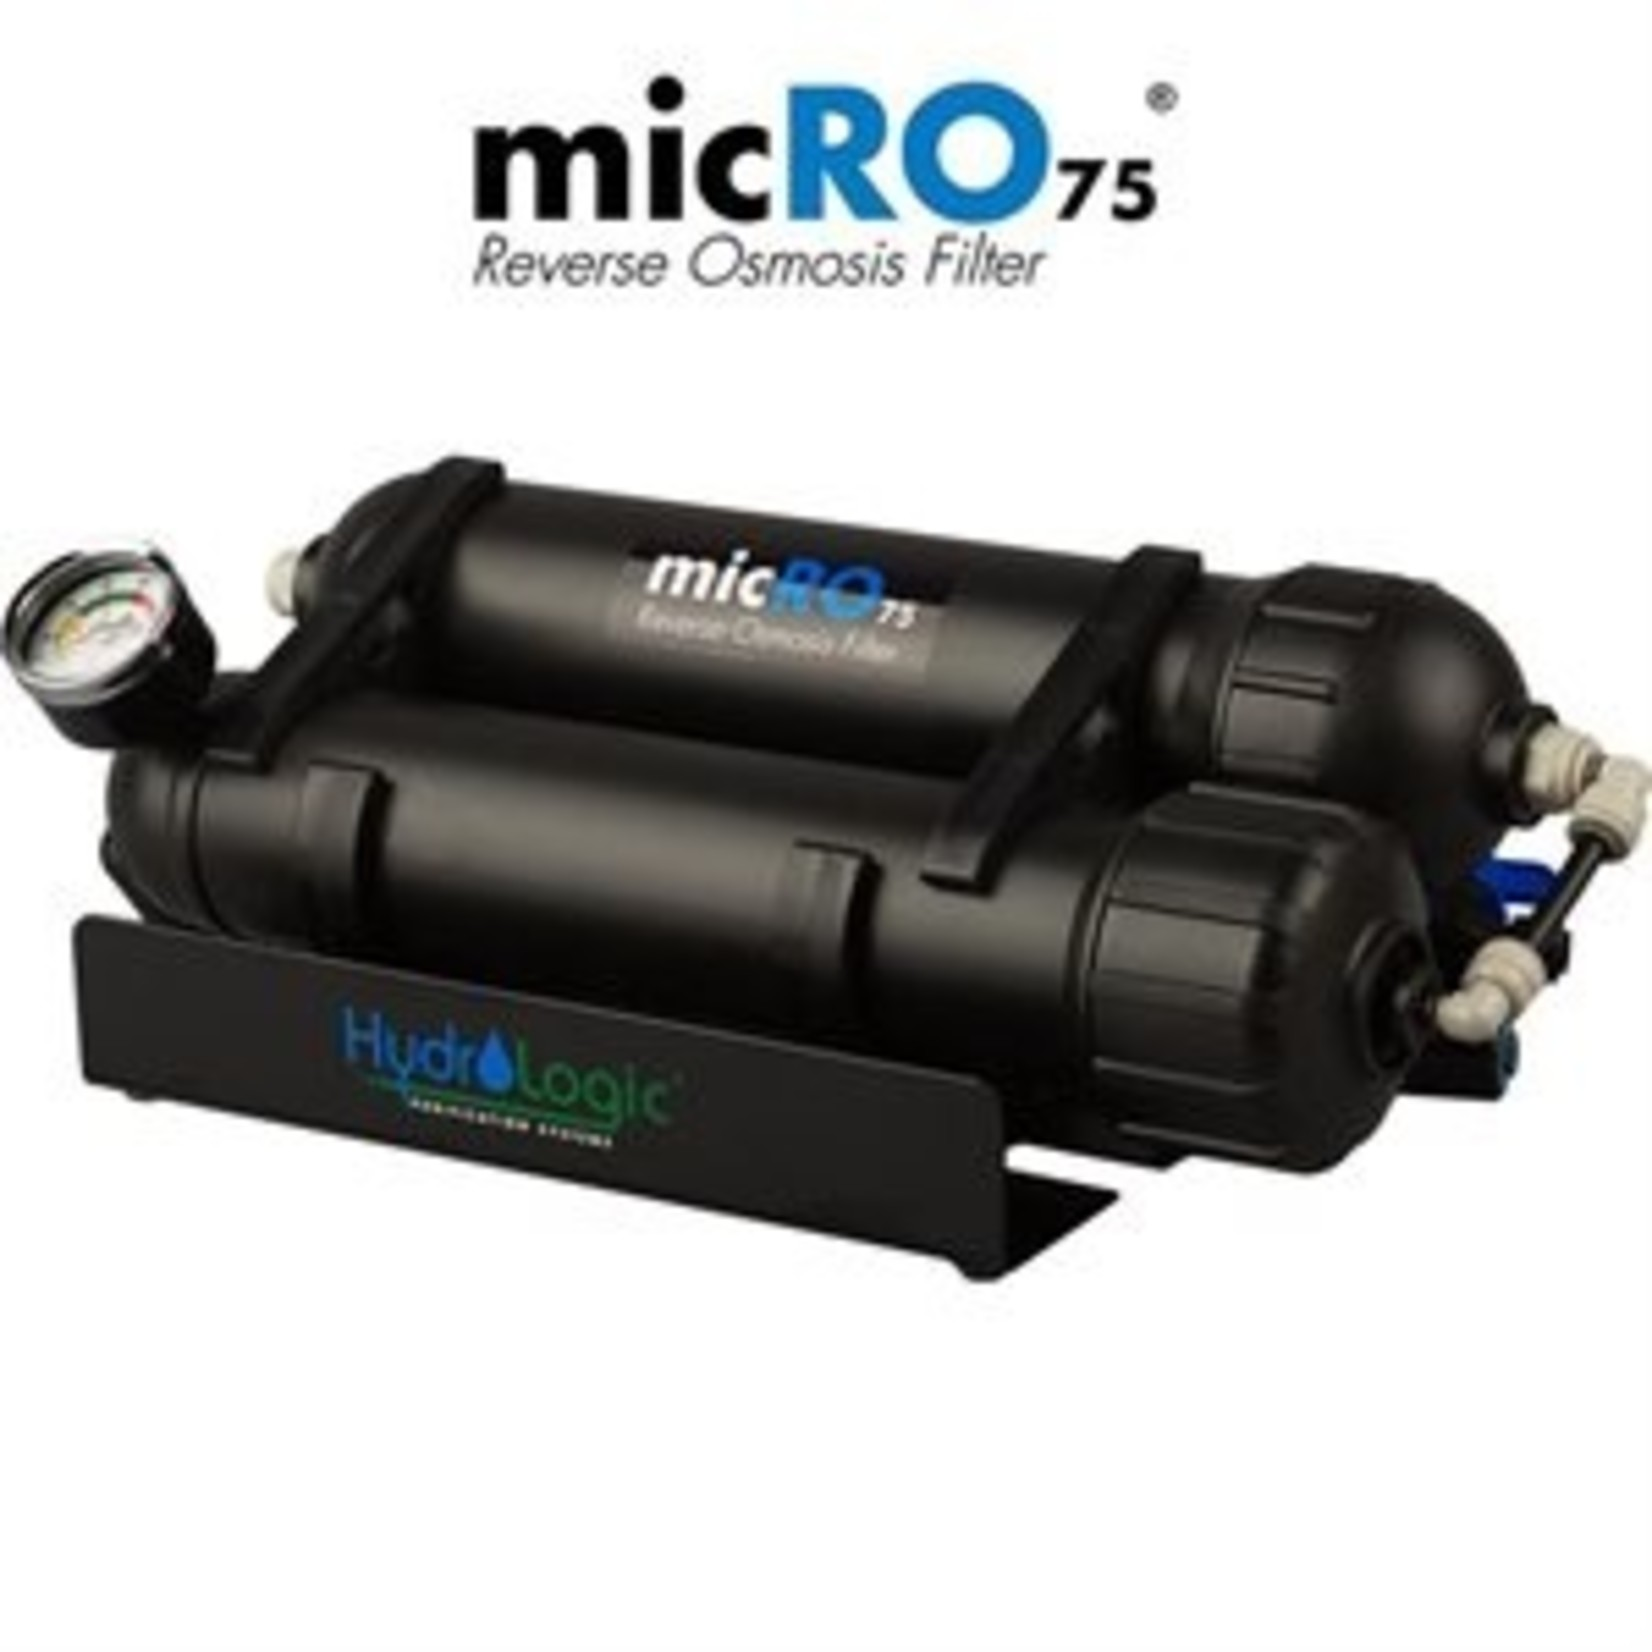 Hydrologic HYDROLOGIC MICRO-75 REVERSE OSMOSIS FILTER